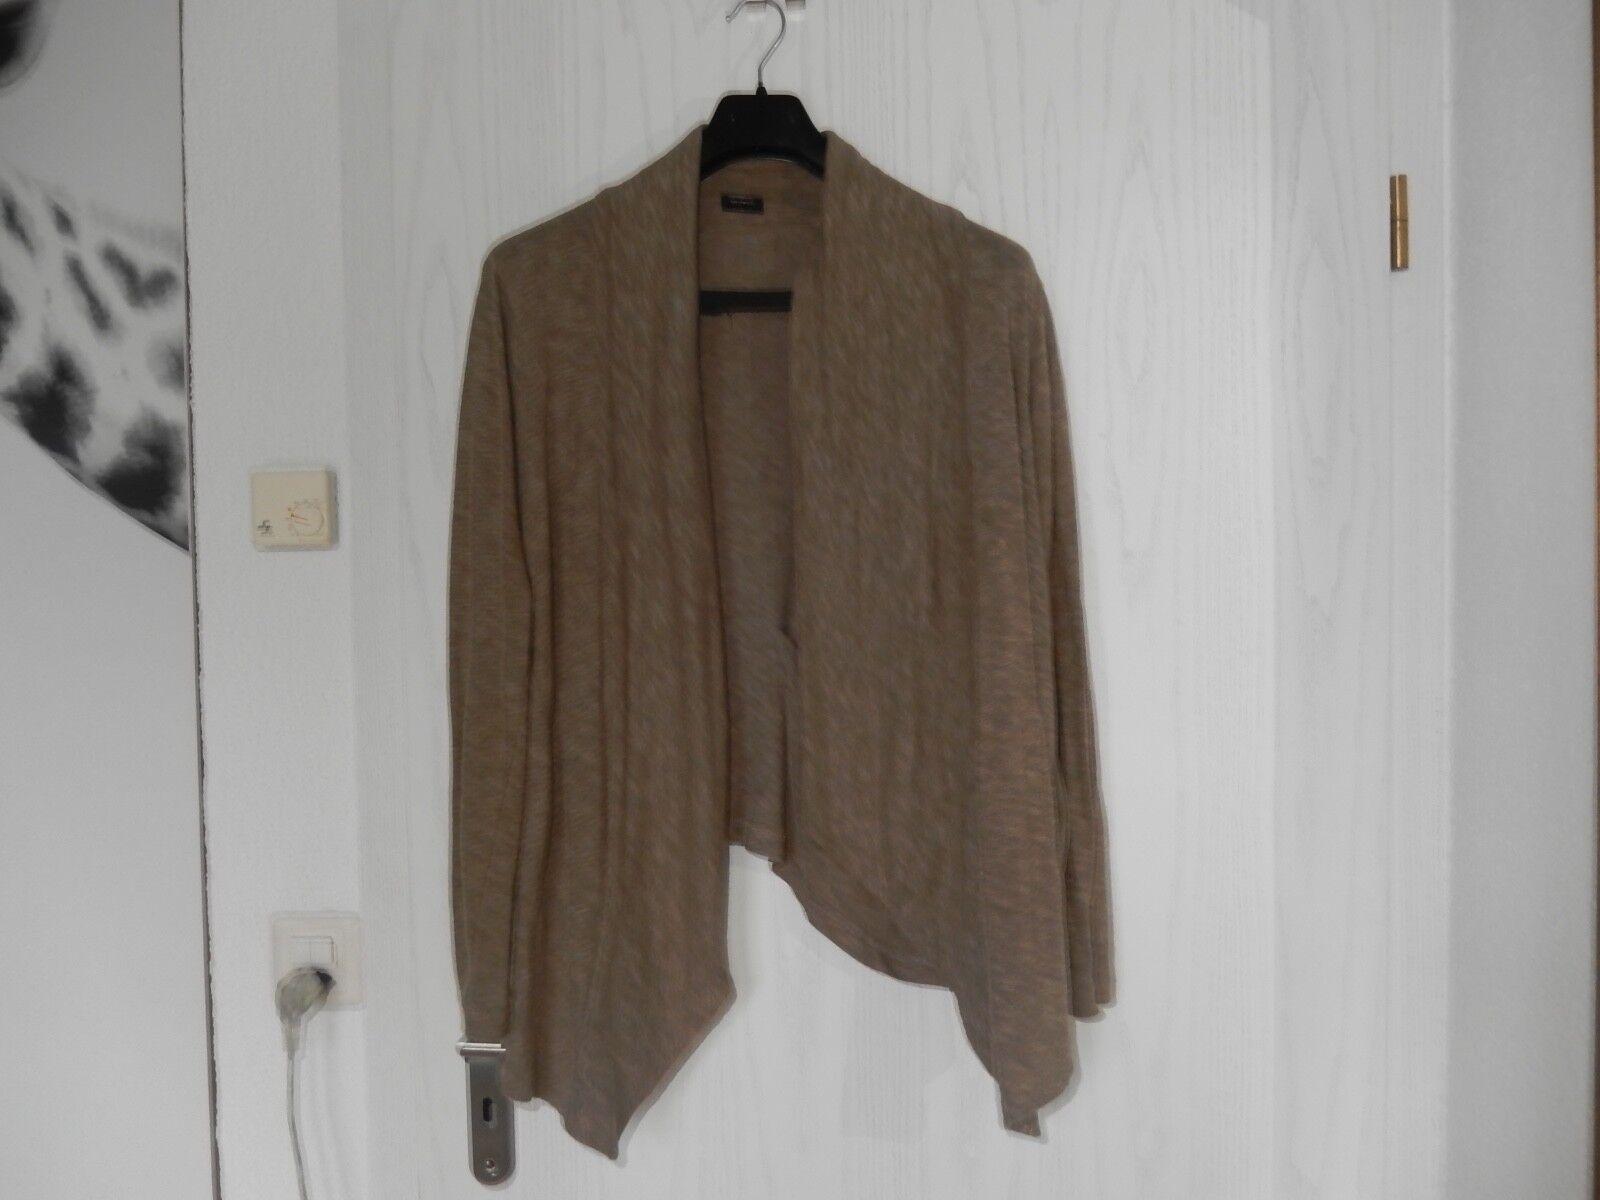 Sandwich Cardigan Knitted Jacket Brau SIZE L LAYERED TOP